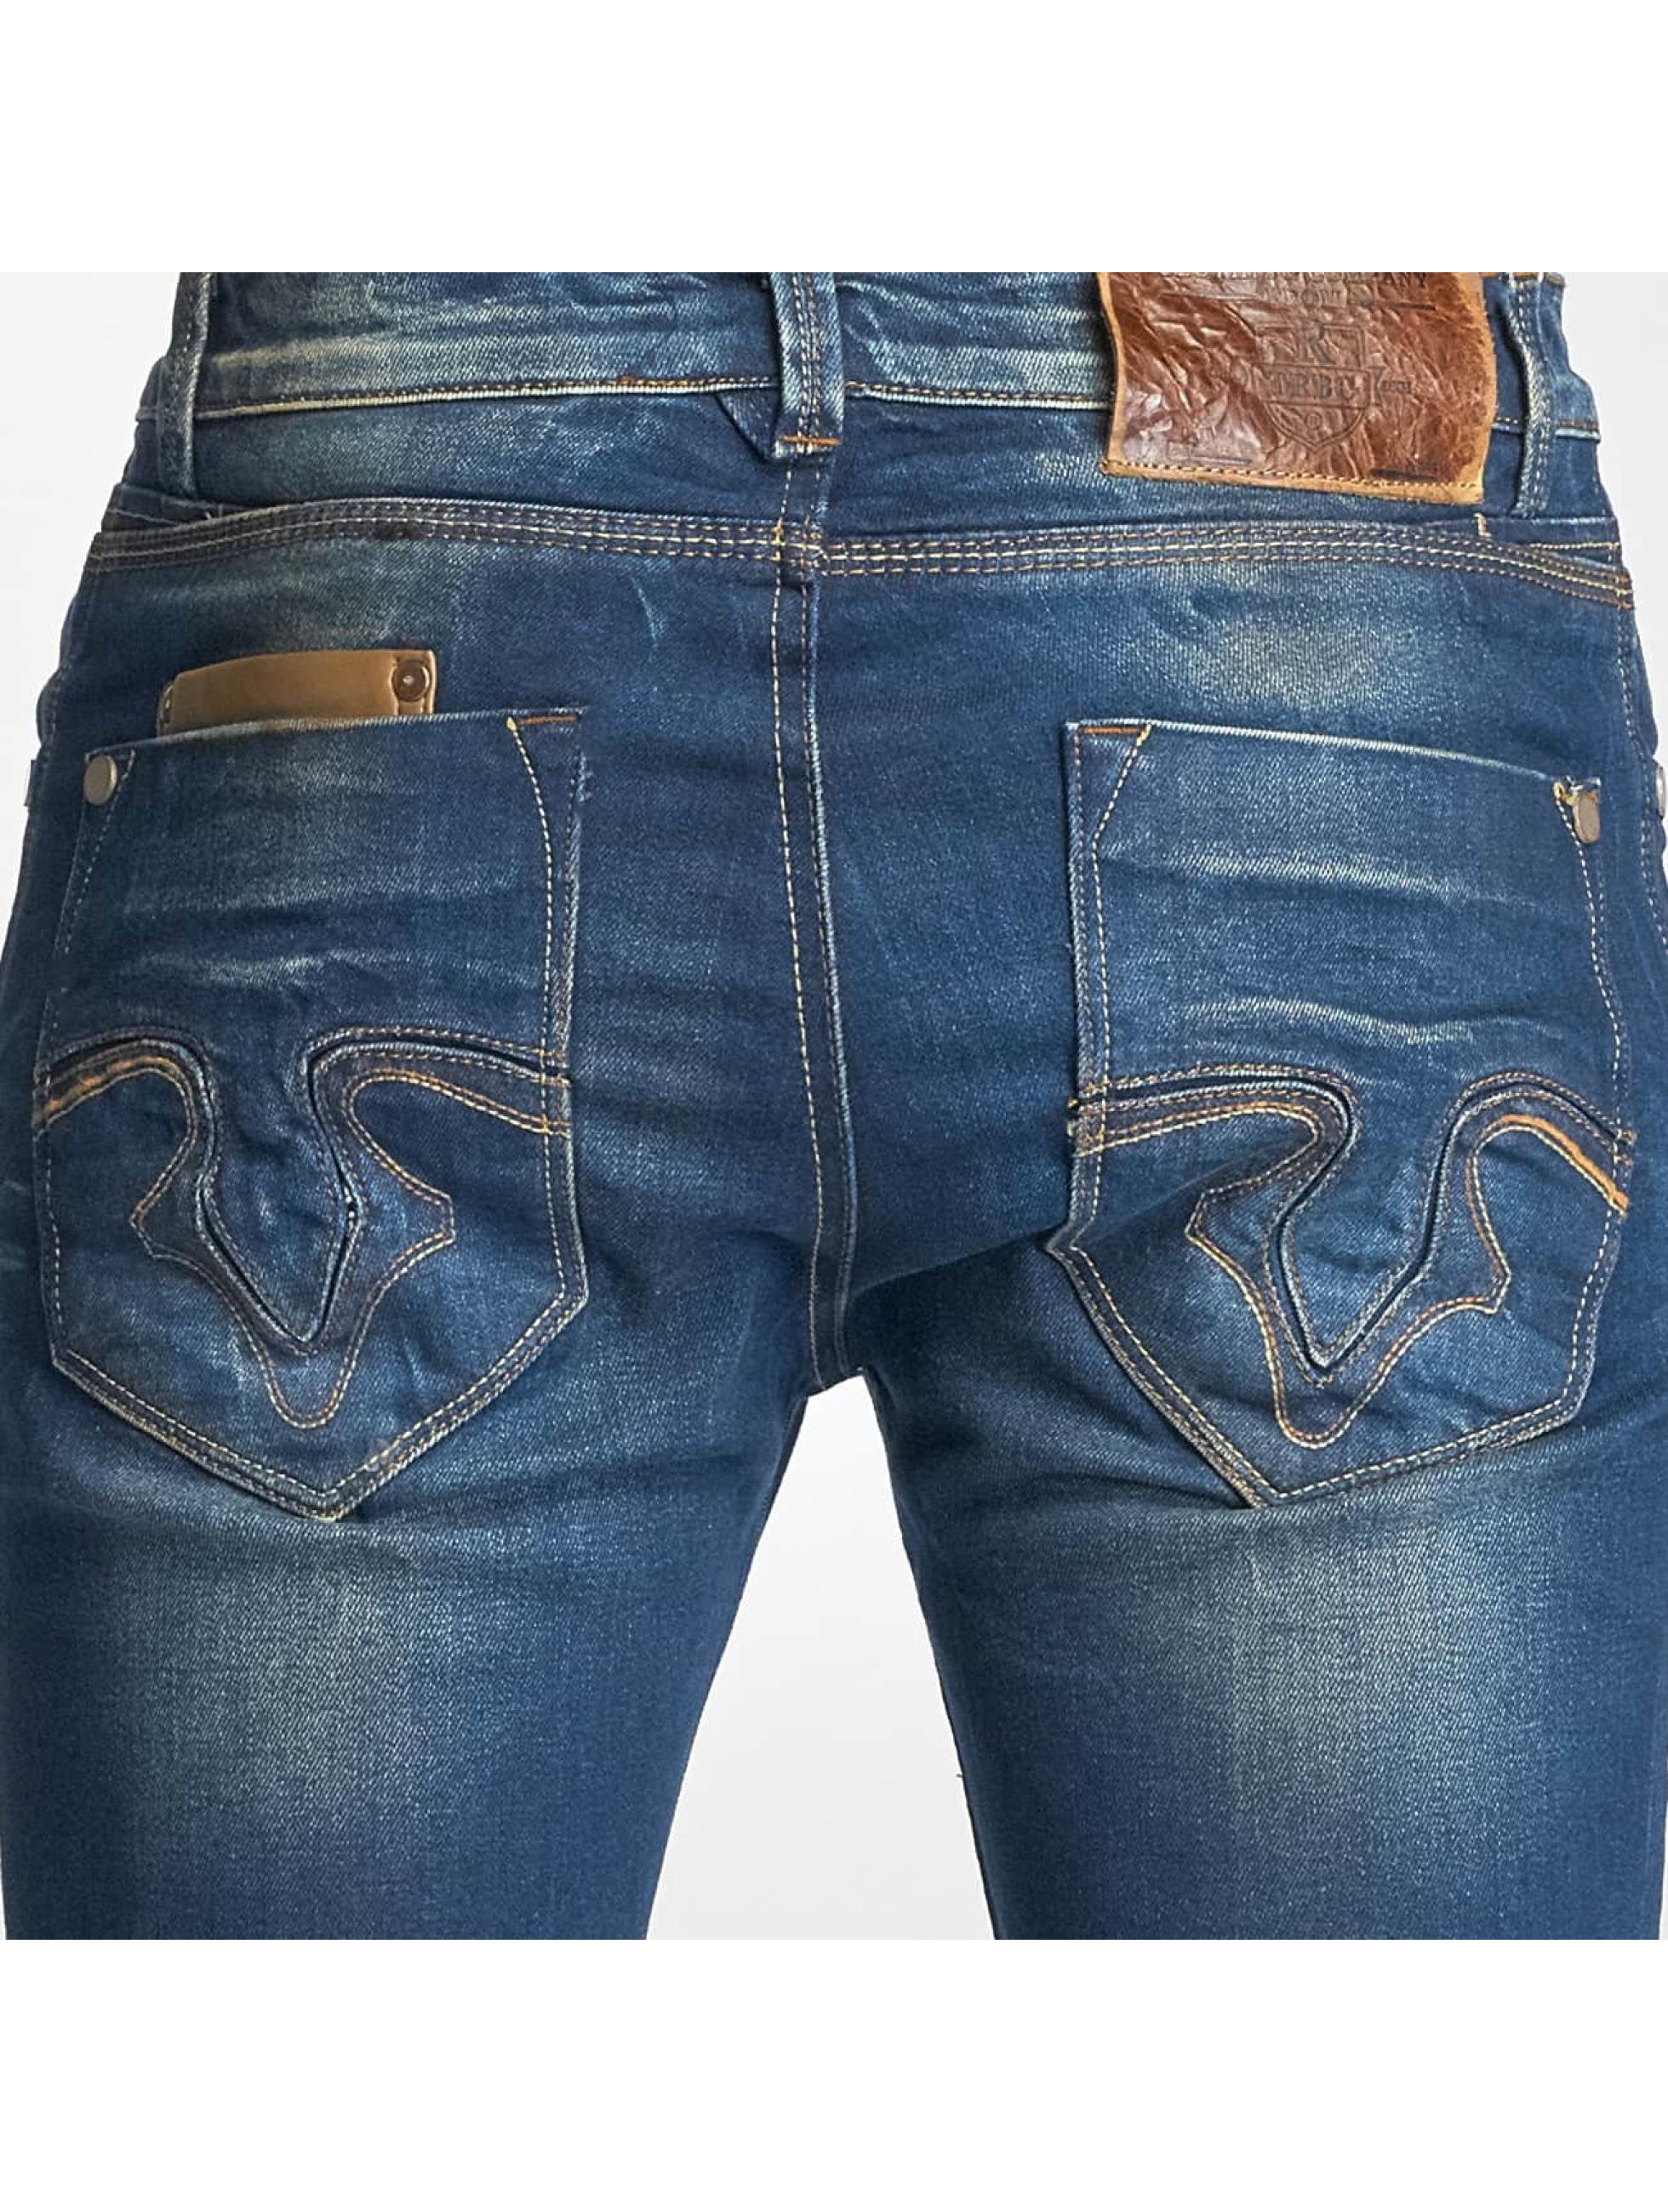 Red Bridge Slim Fit Jeans Washed blauw